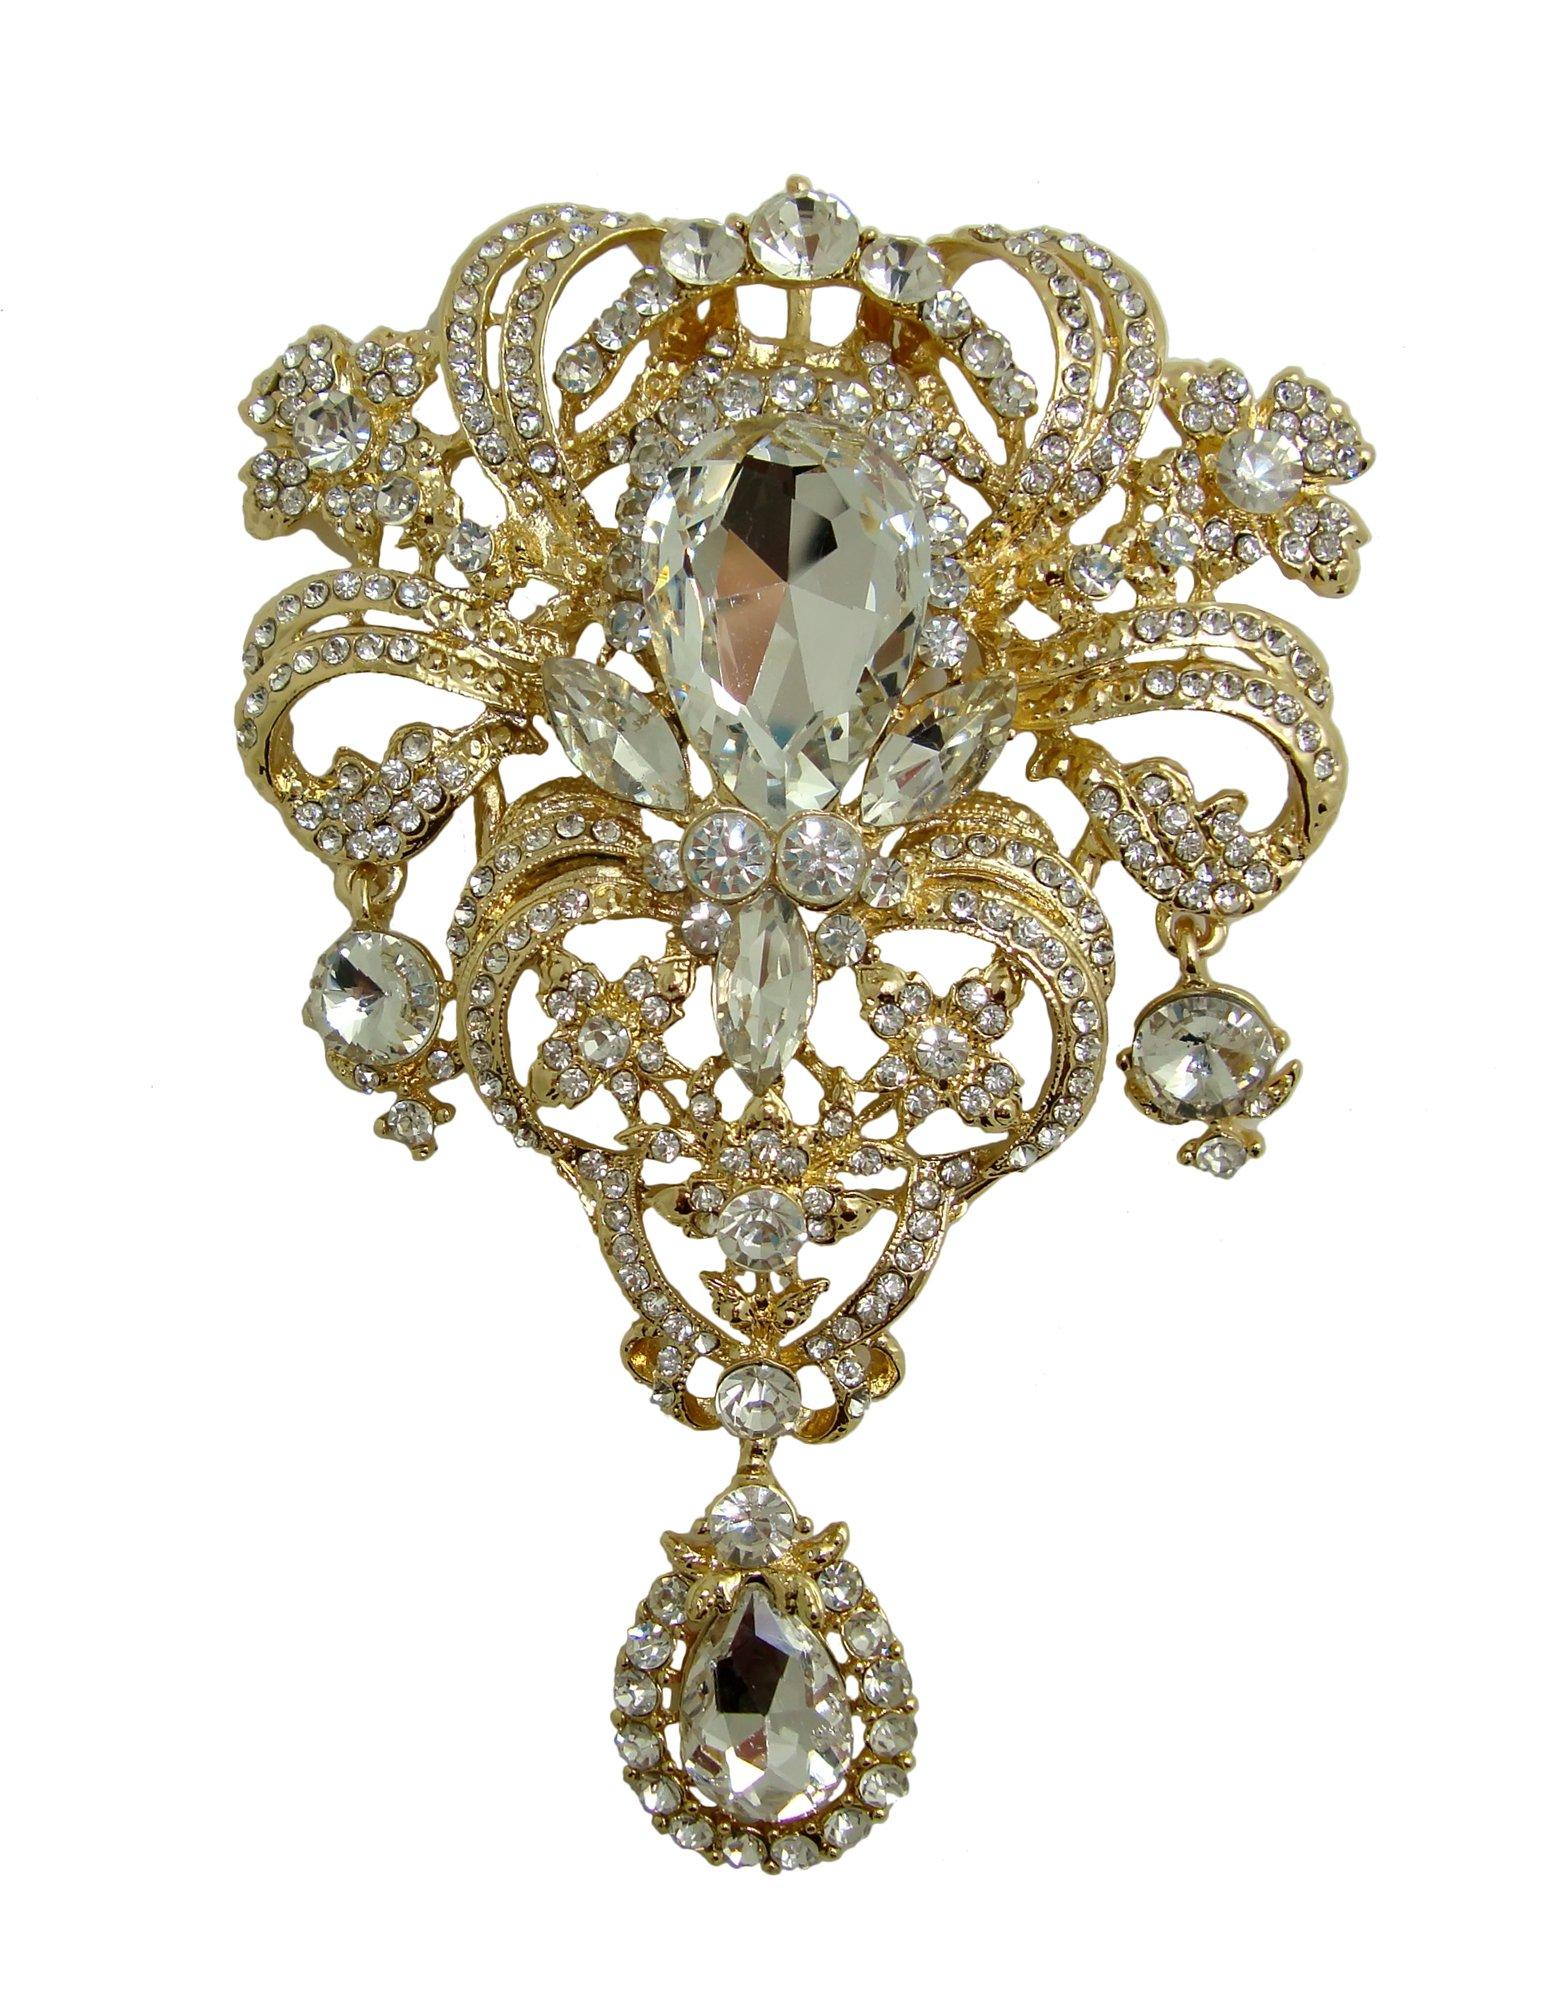 TTjewelry Classic Style Flower Drop Brooch Pin Rhinestone Crystal Pendant (White Gold-tone)